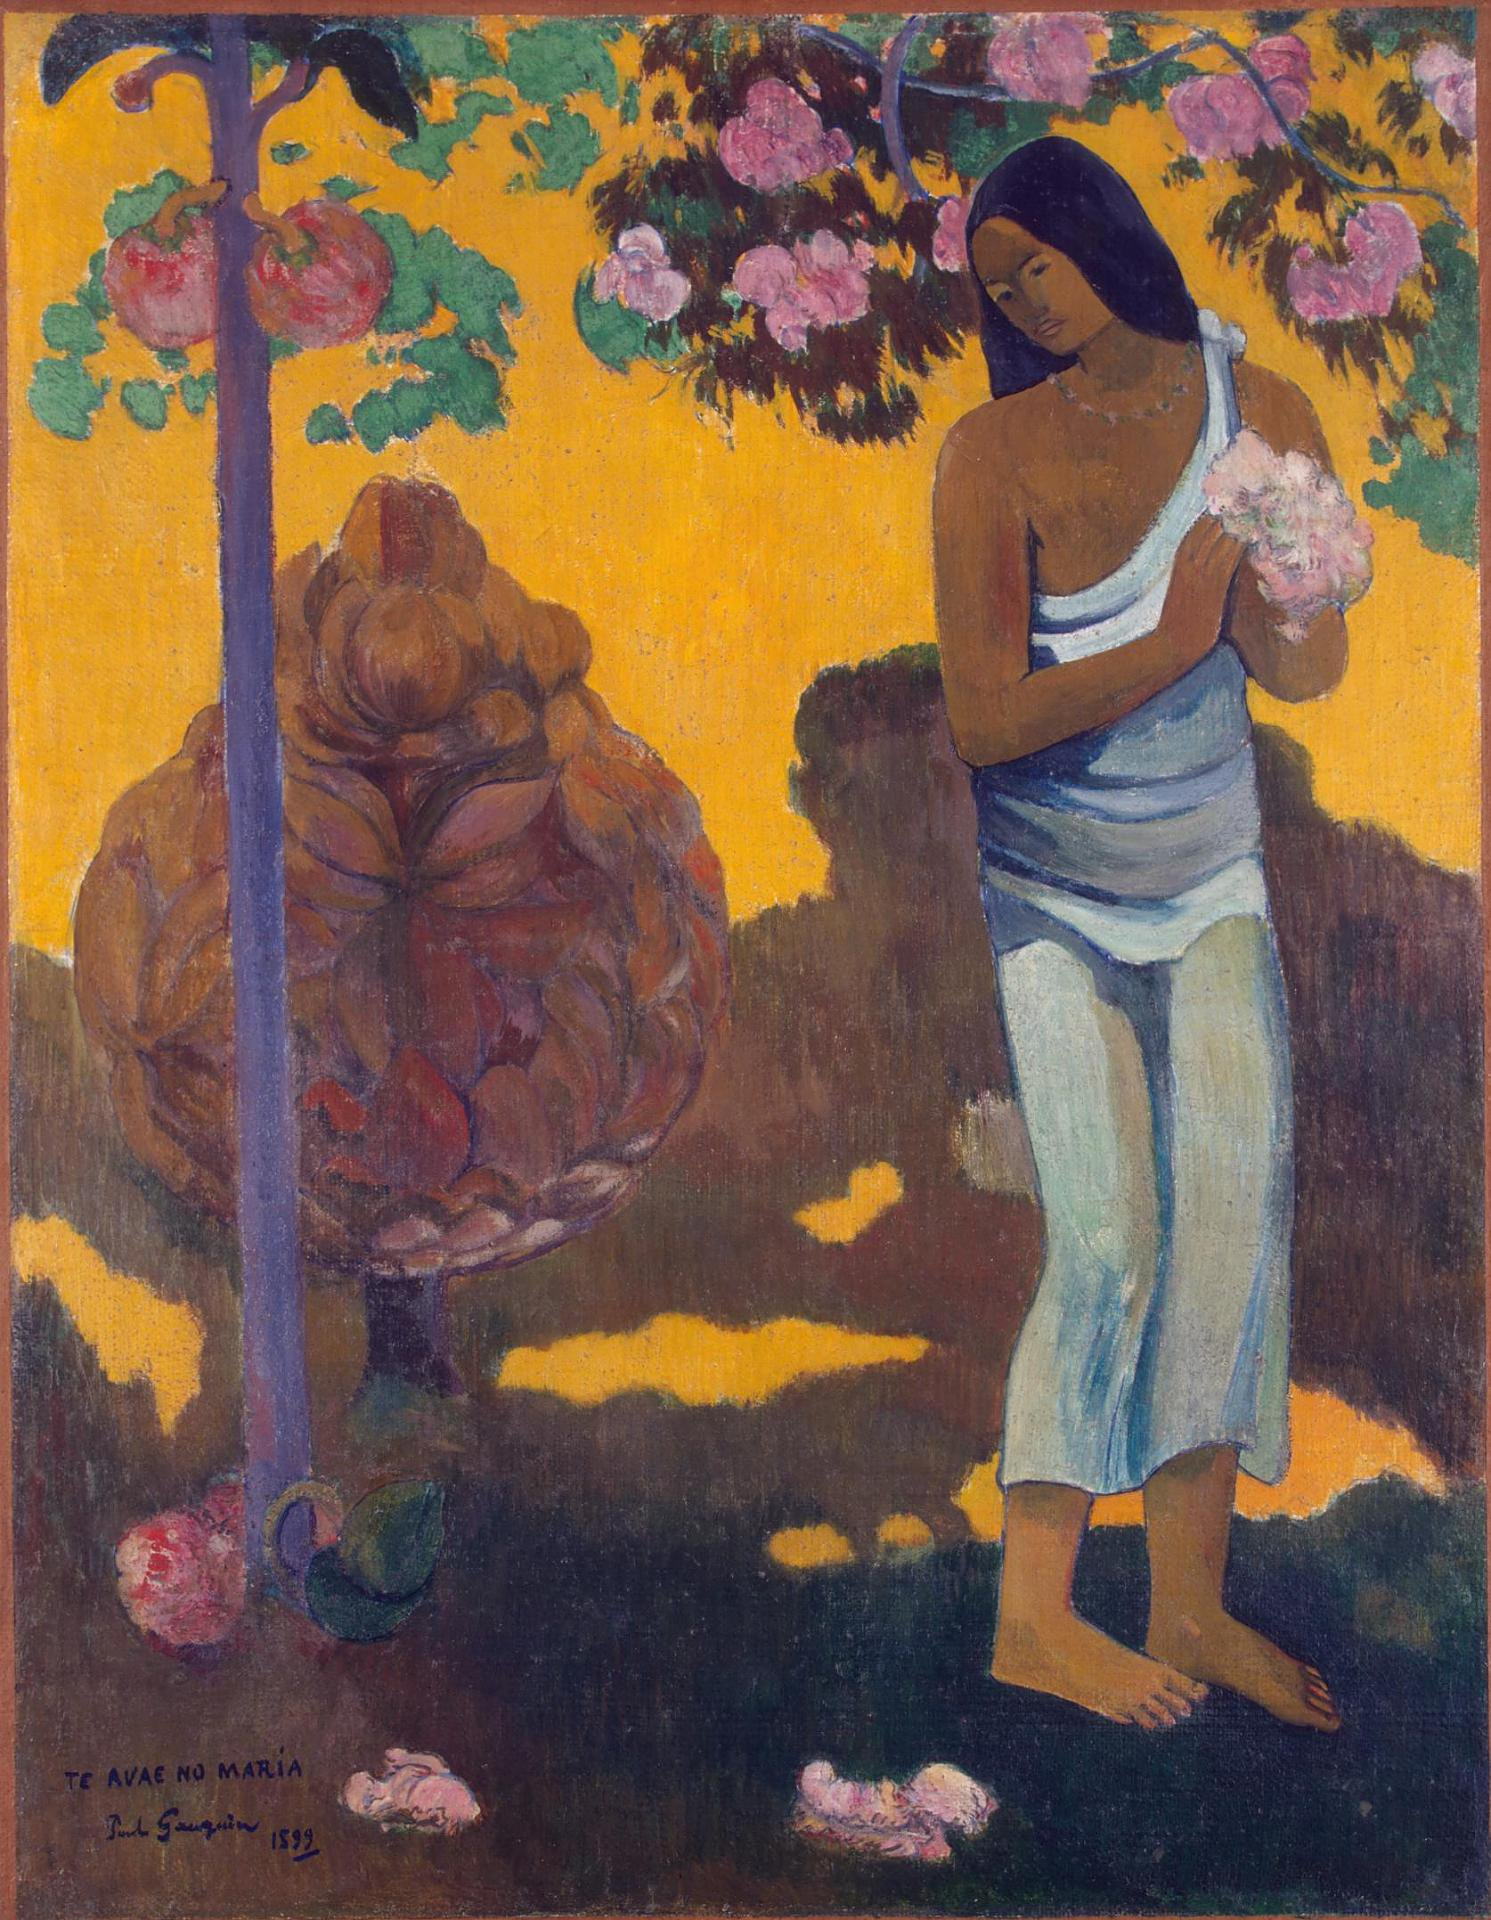 жанровая картина < te Avae No Maria  ( месяц Марии ) > :: Поль Гоген - Гоген Поль ( Paul Gauguin ) фото